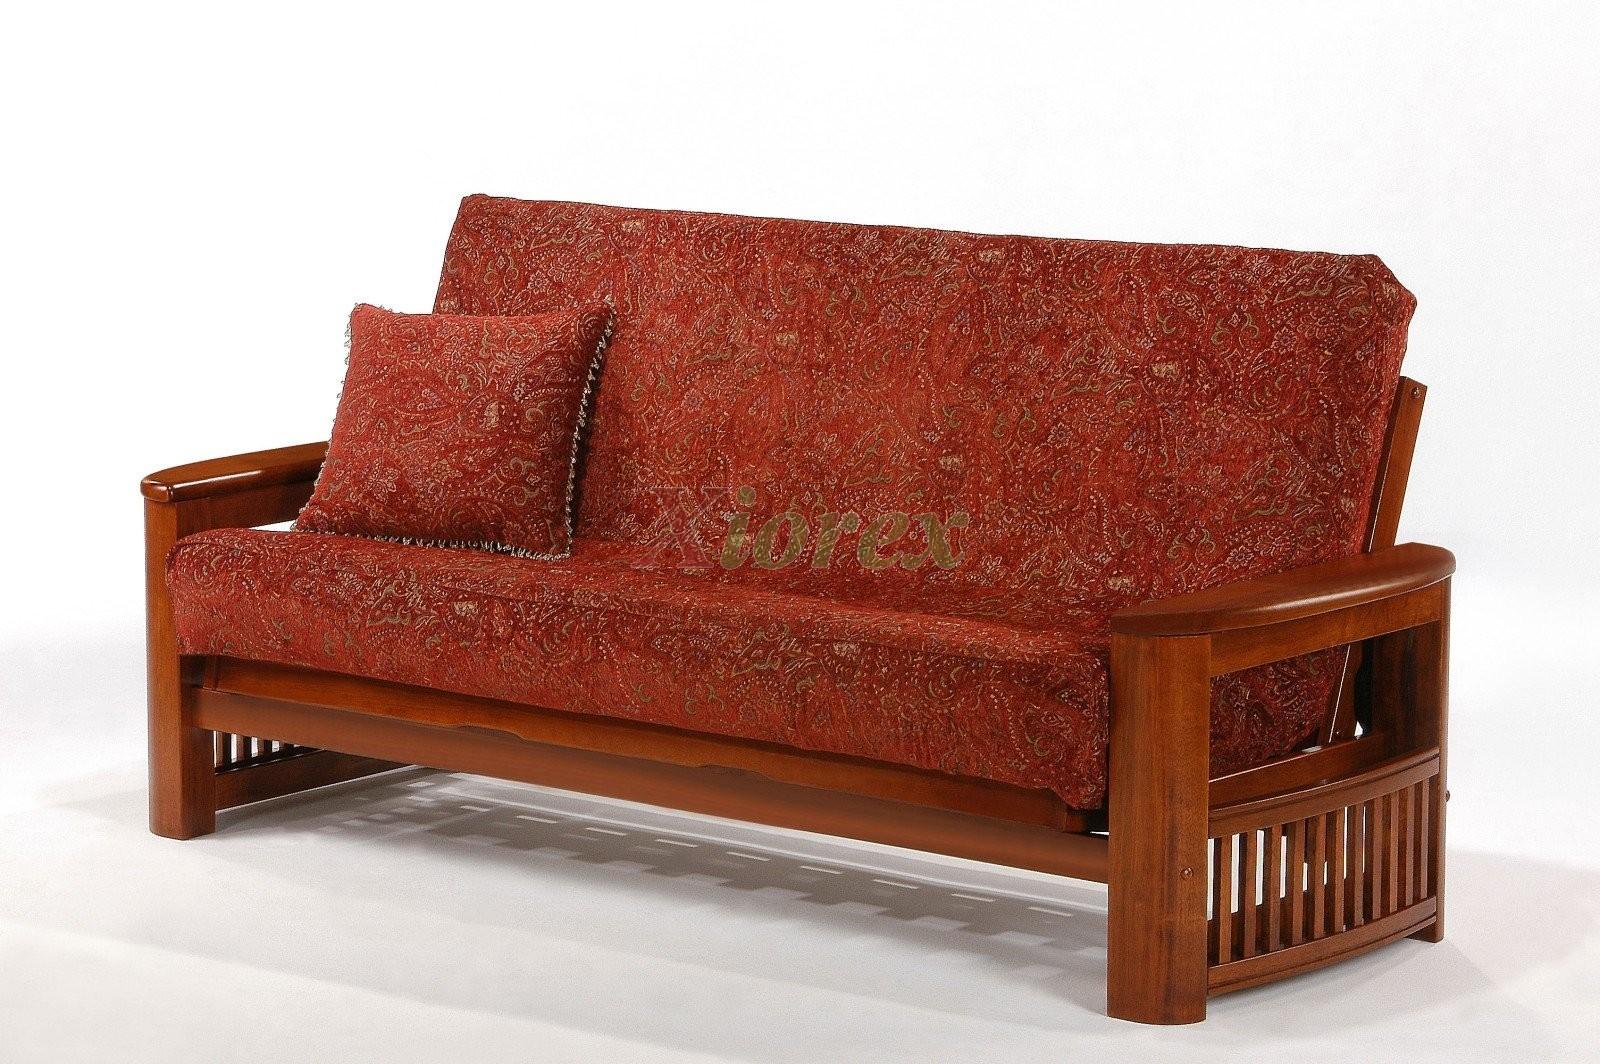 futon furniture night and day shadow futon cherry   xiorex shadow futon furniture night  u0026 day shadow futon w storage box   xiorex  rh   xiorex